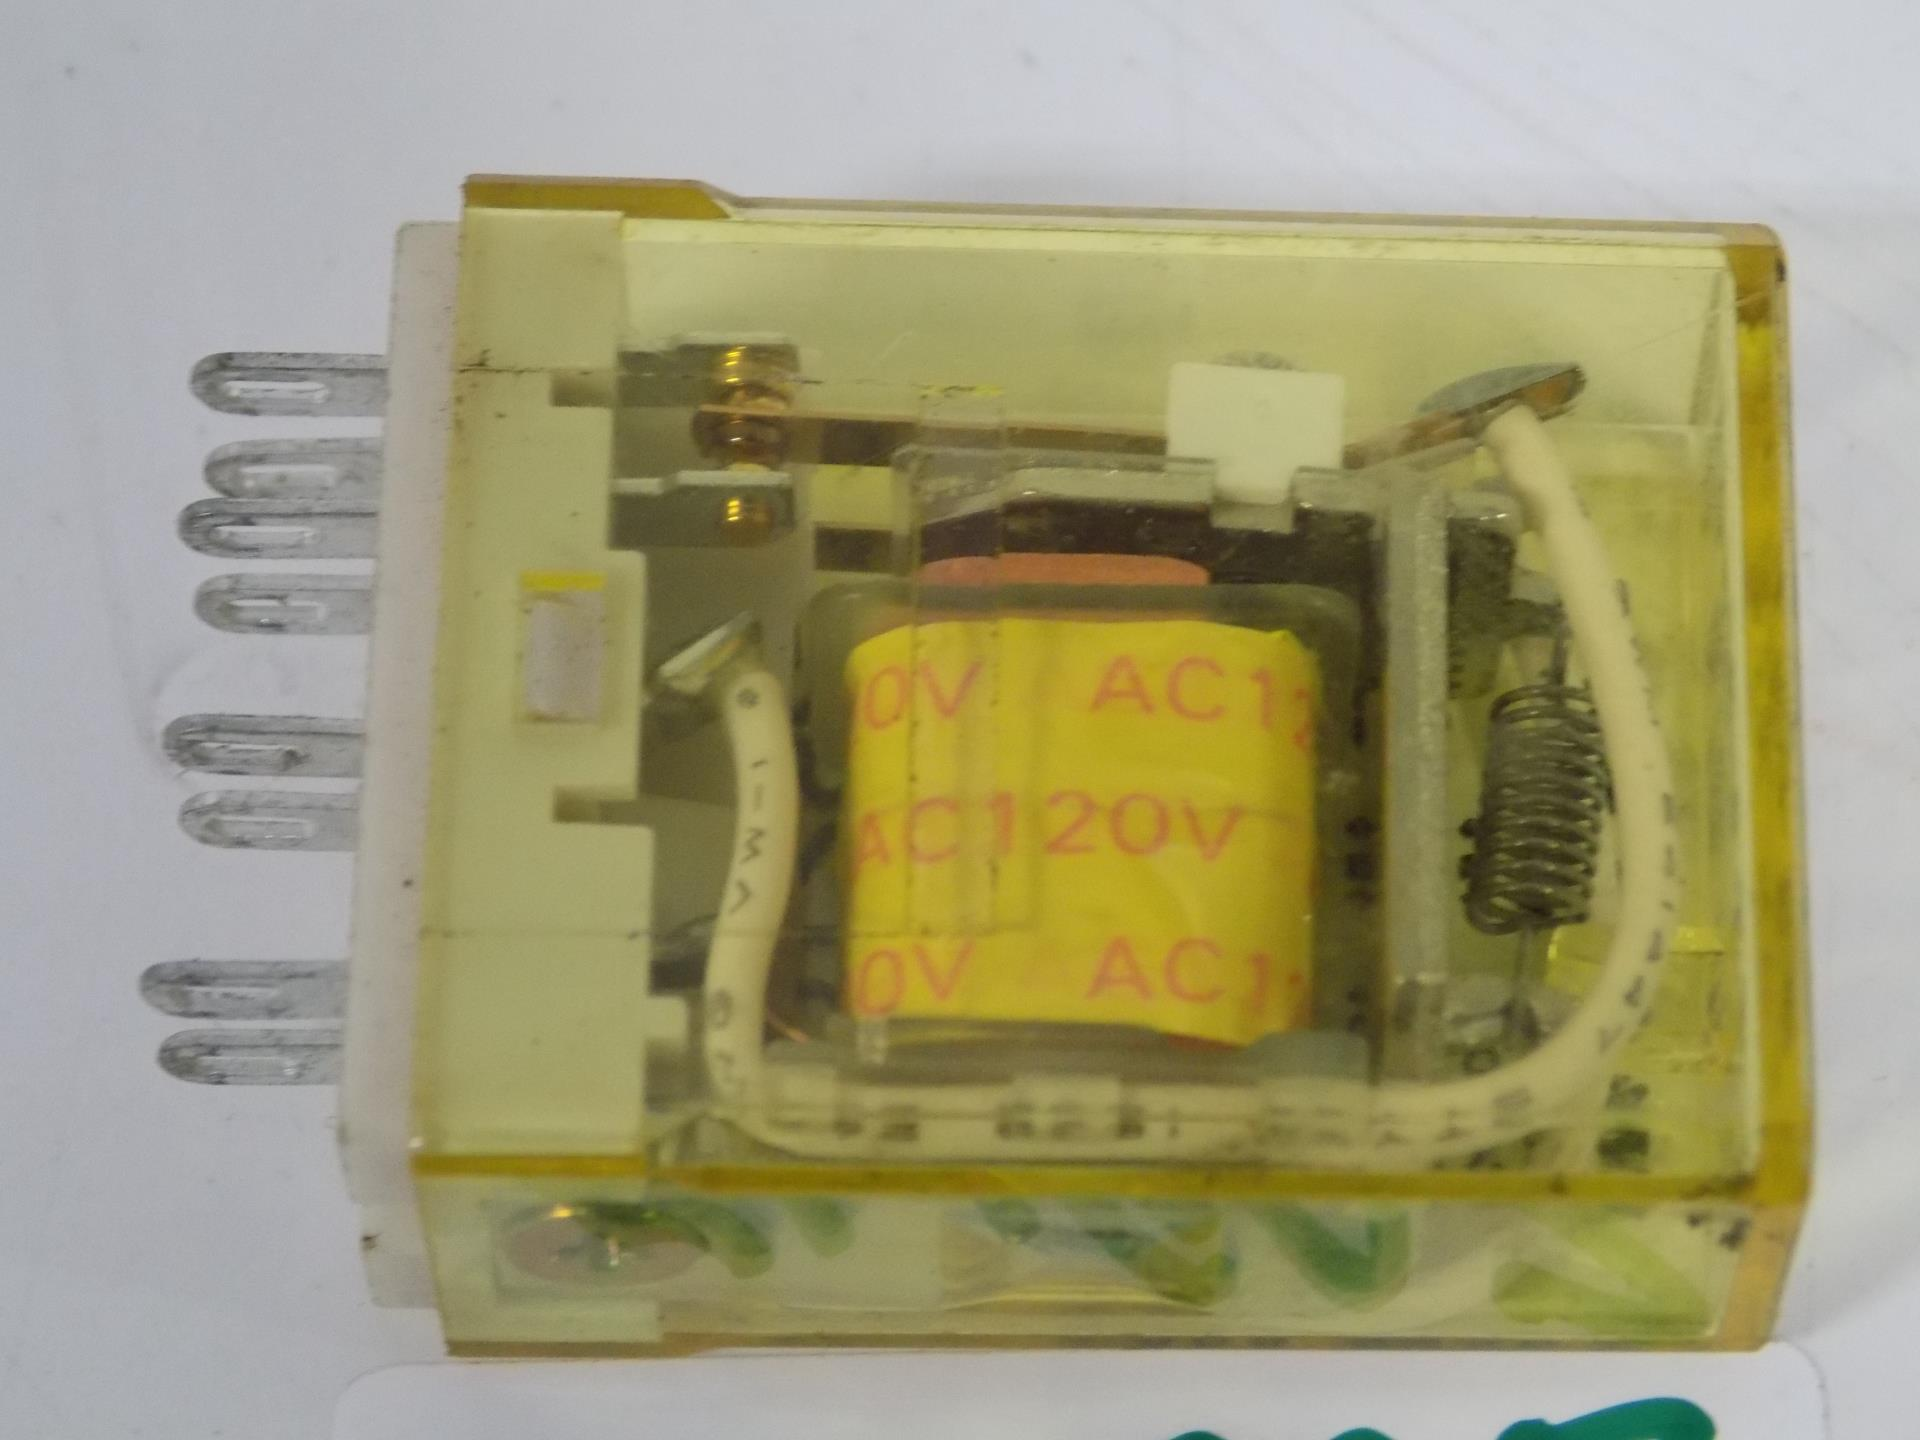 IDEC AC120V RELAY LOT OF 4  RY2S-U